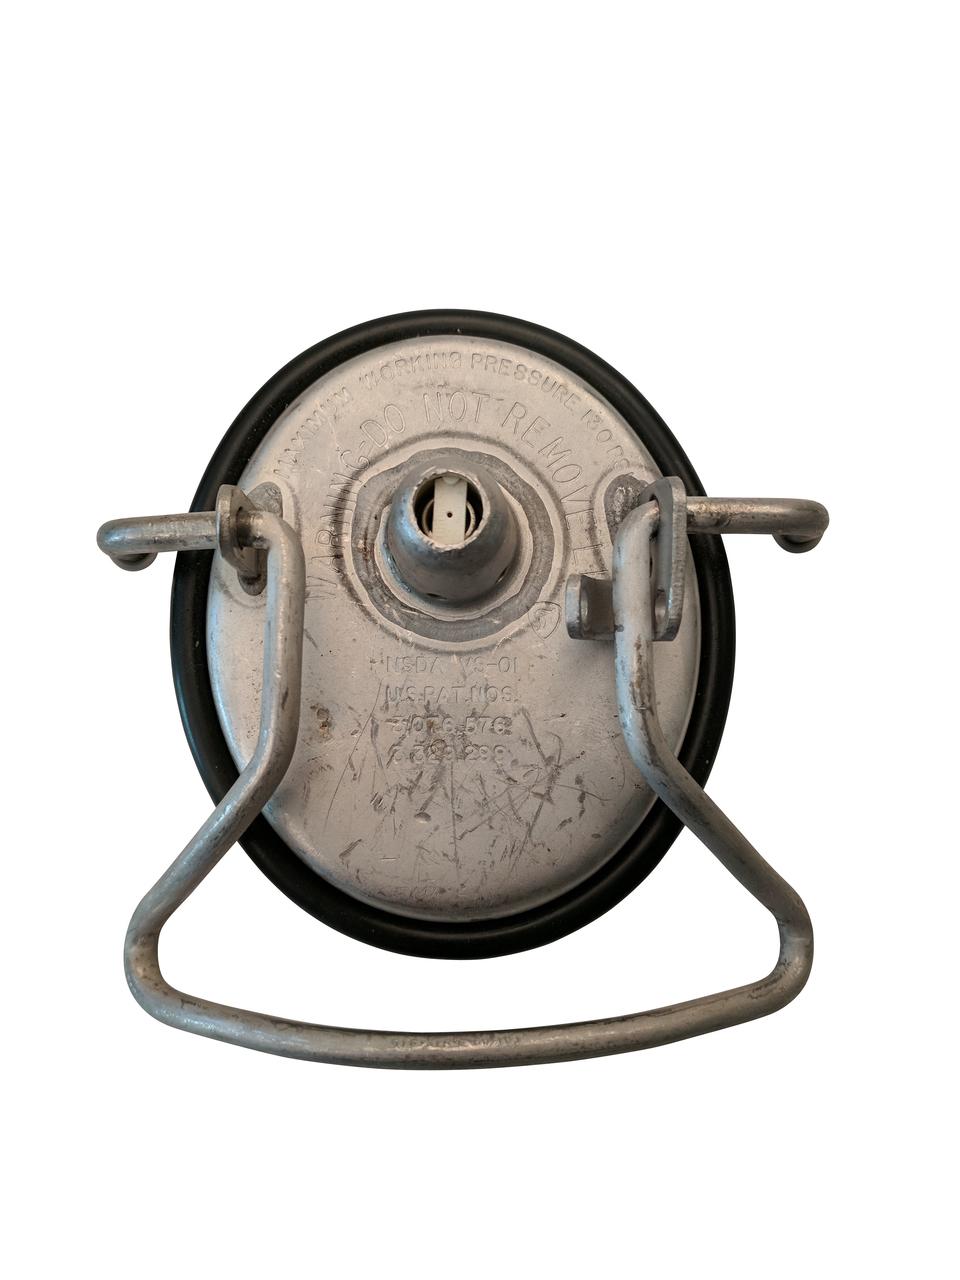 Used Pin lock Keg Lid